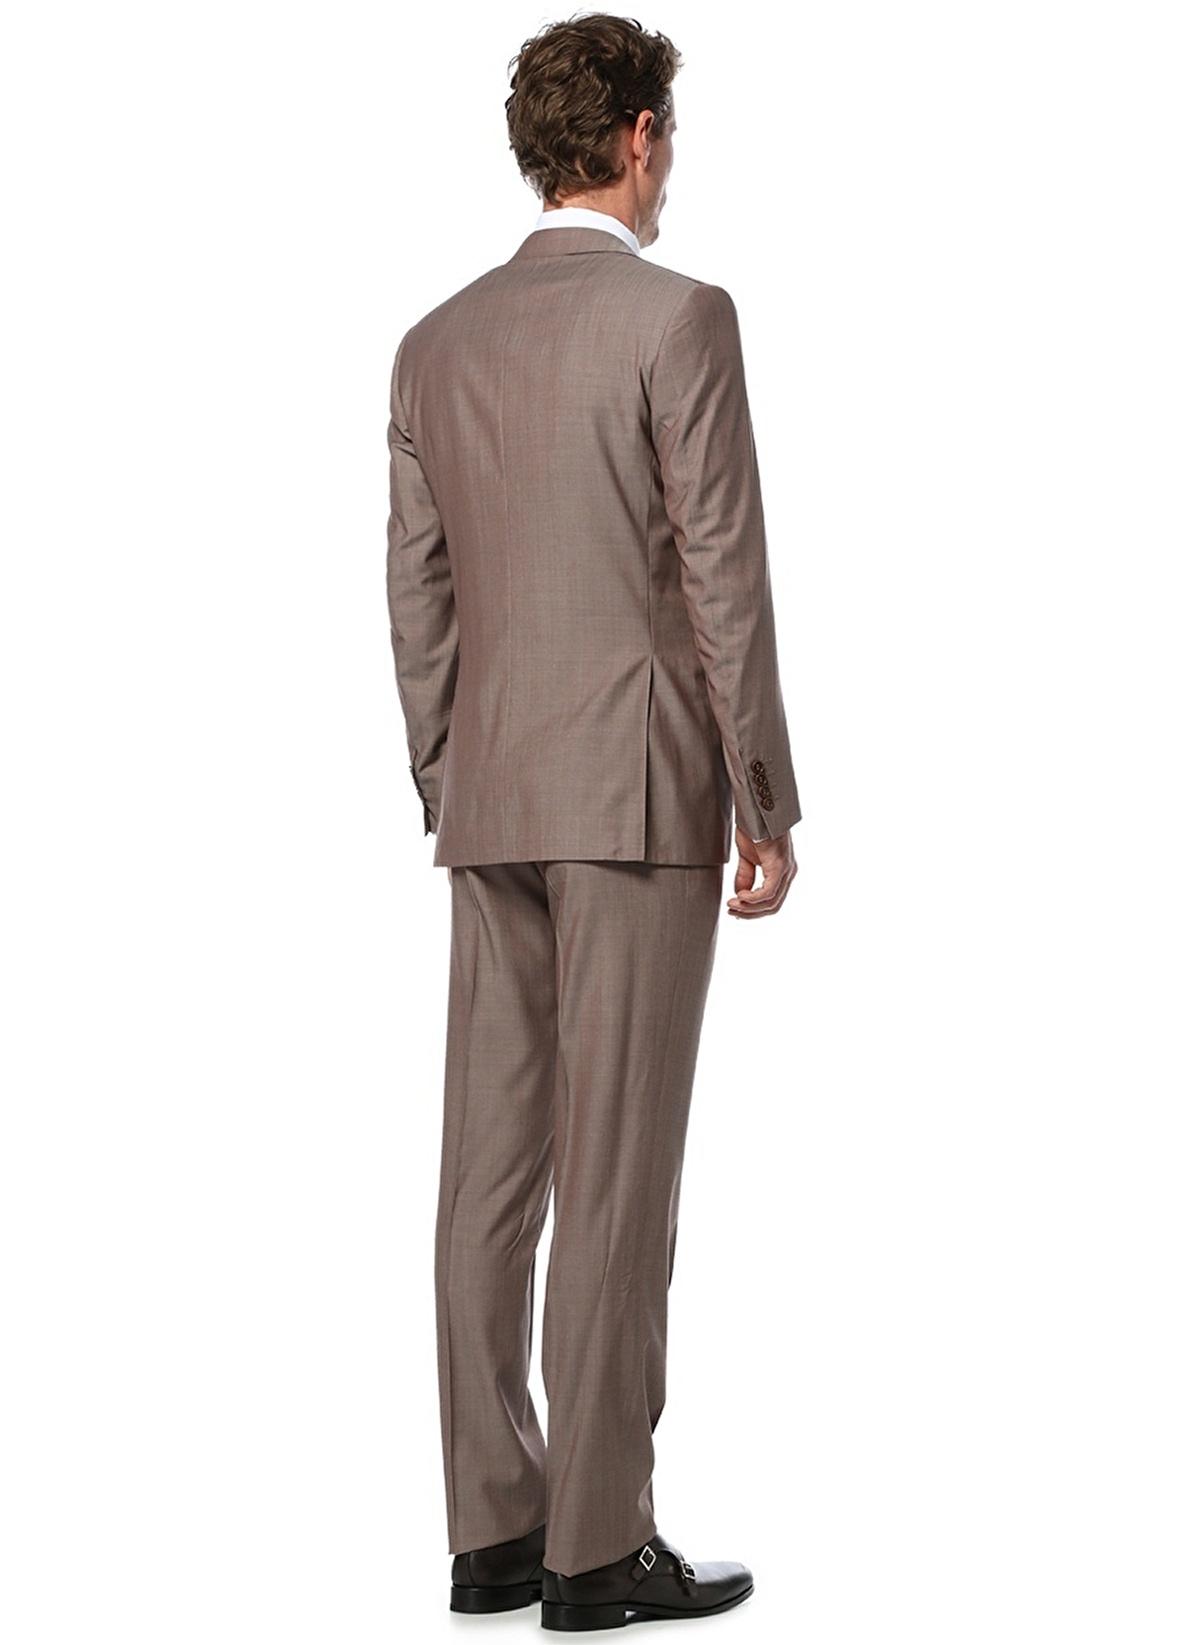 72bf75e4f3d1f Canali Erkek Takım Elbise Açık Kahverengi | Morhipo | 16458789